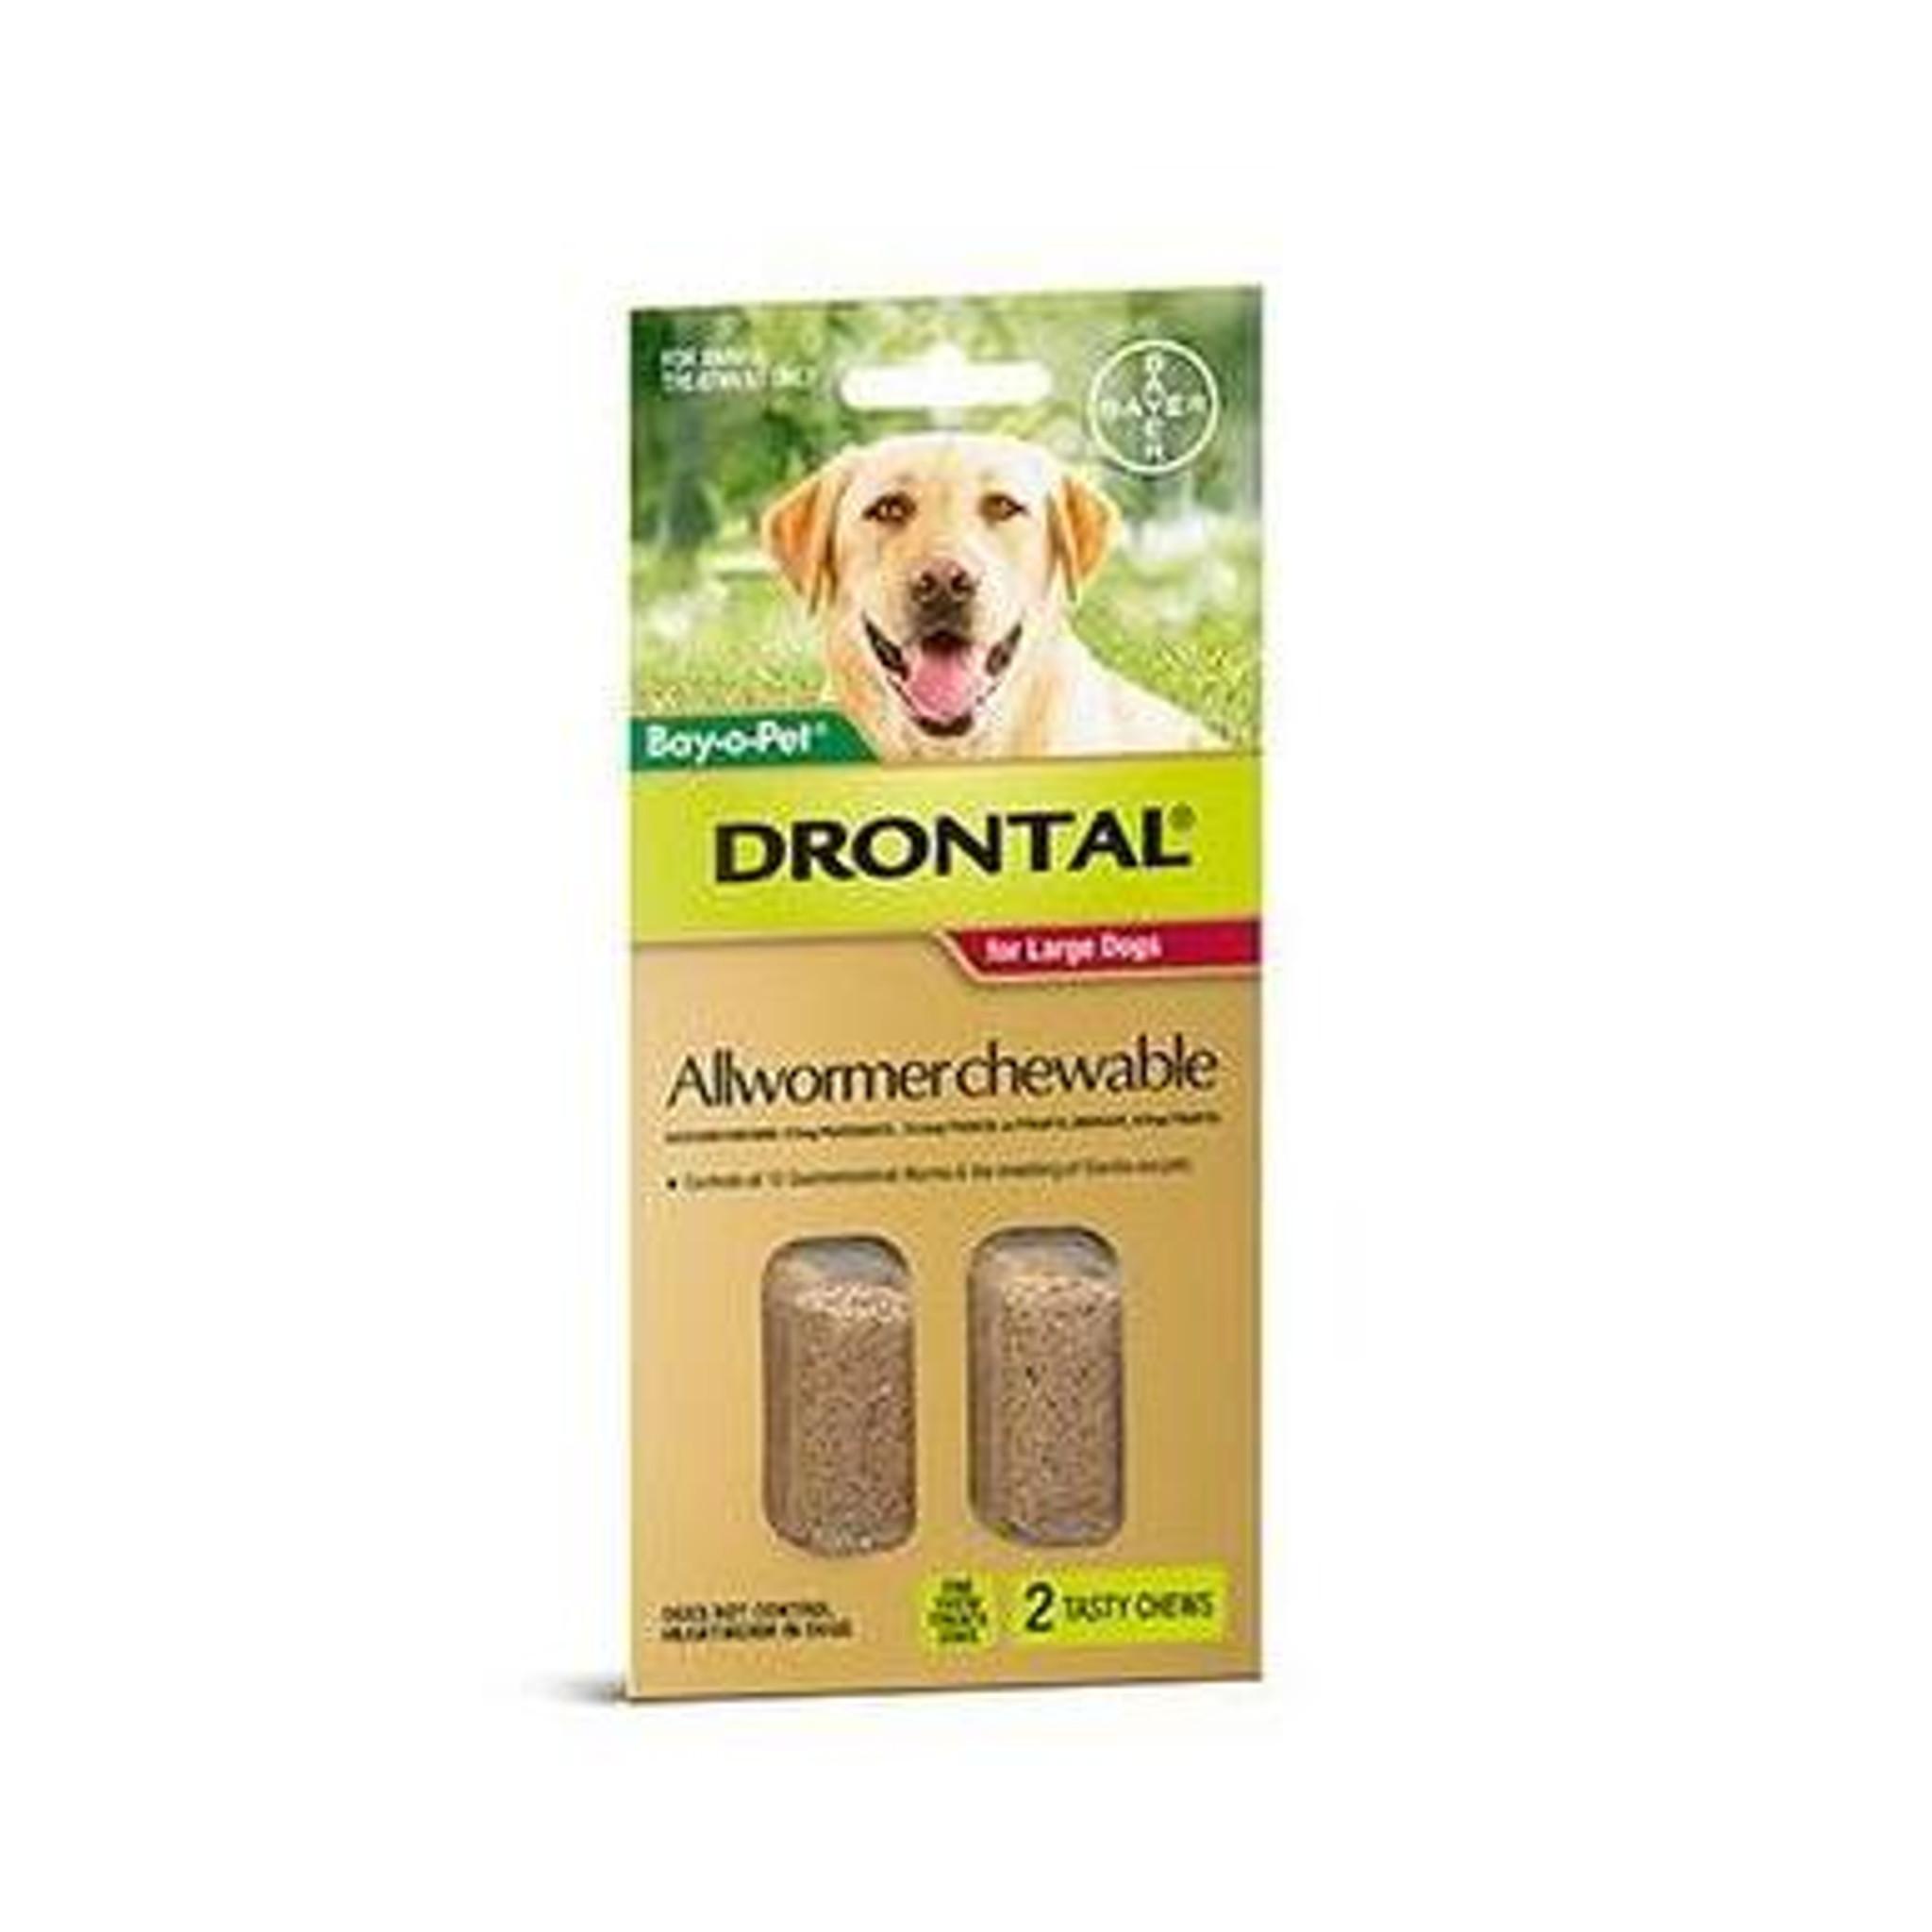 Drontal plus giardiasis, Using drontal plus for giardia